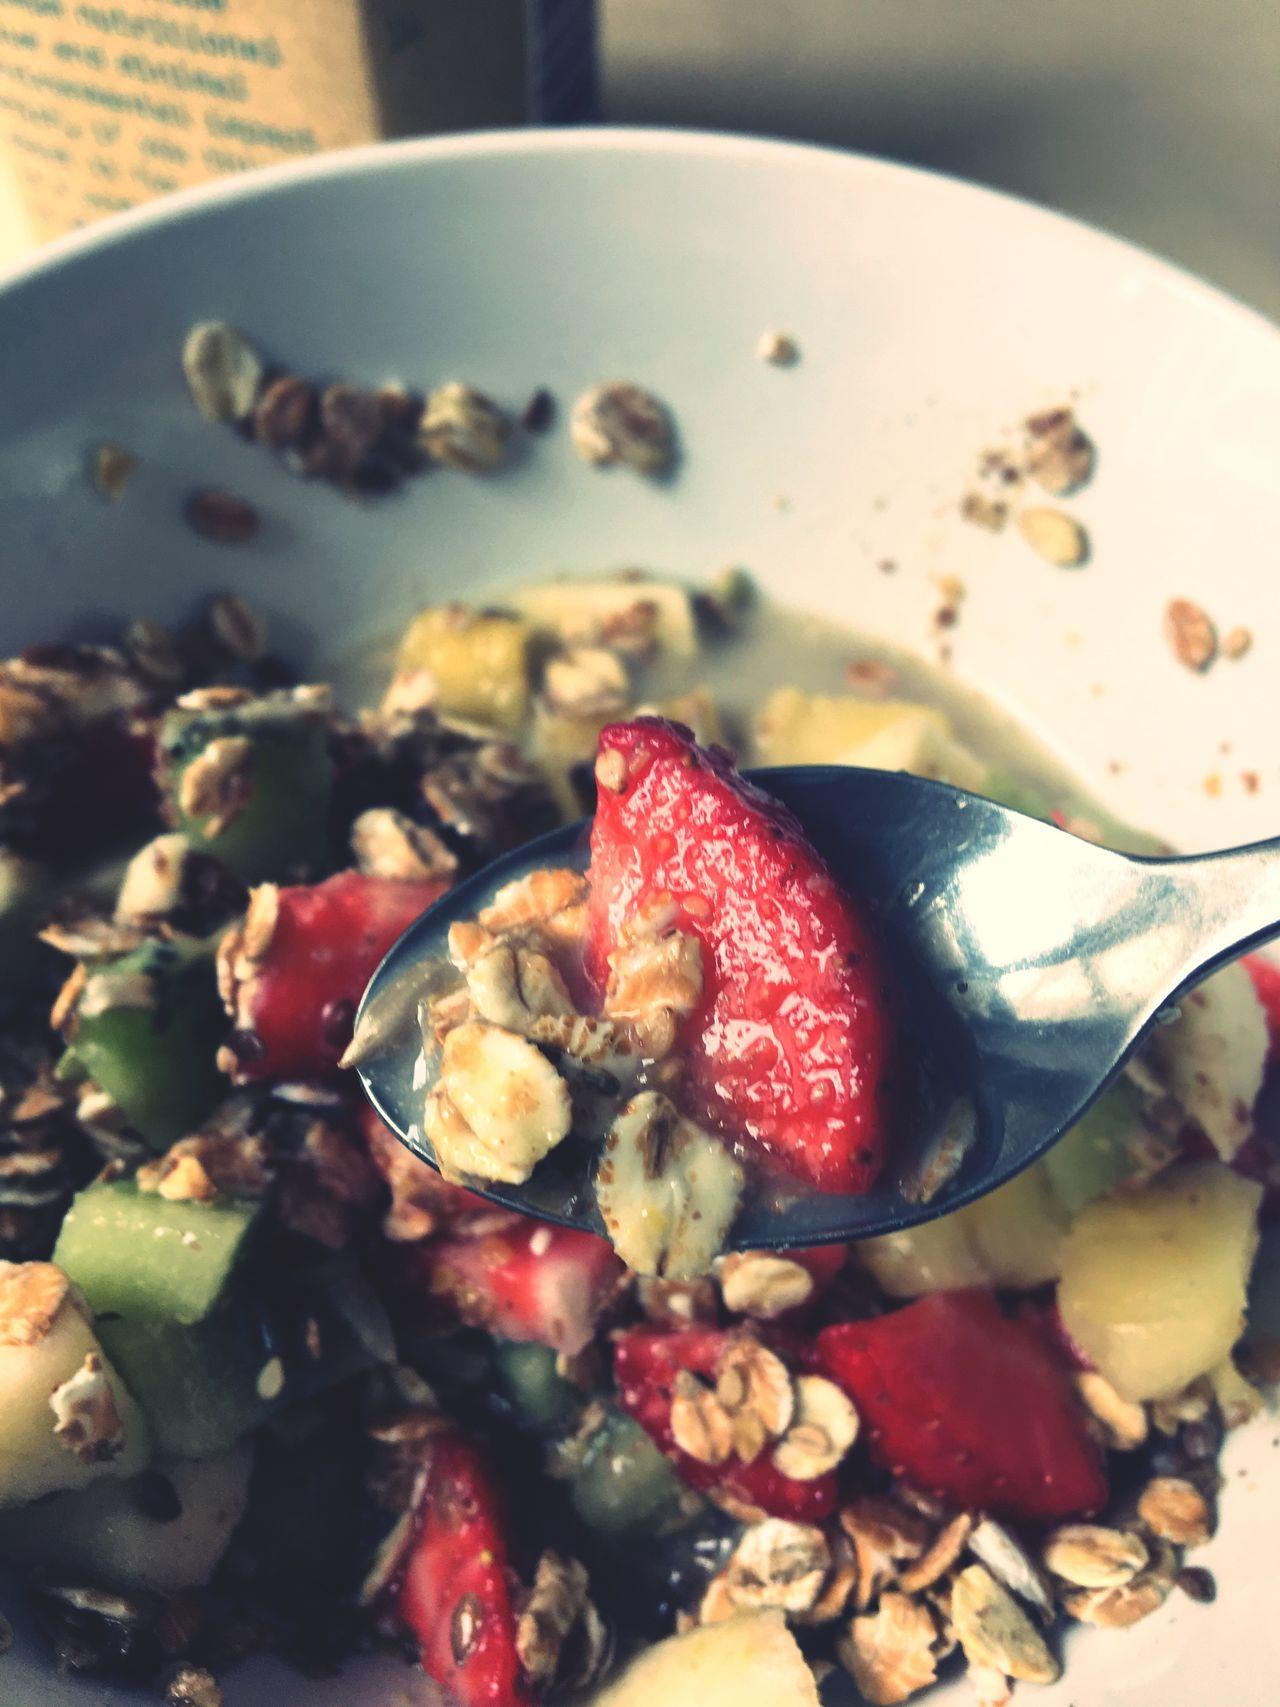 Healthy Eating Breakfast Müsli Strawberry Strawberries Good Morning Freshness Colazione Früstück Fragole Cereali